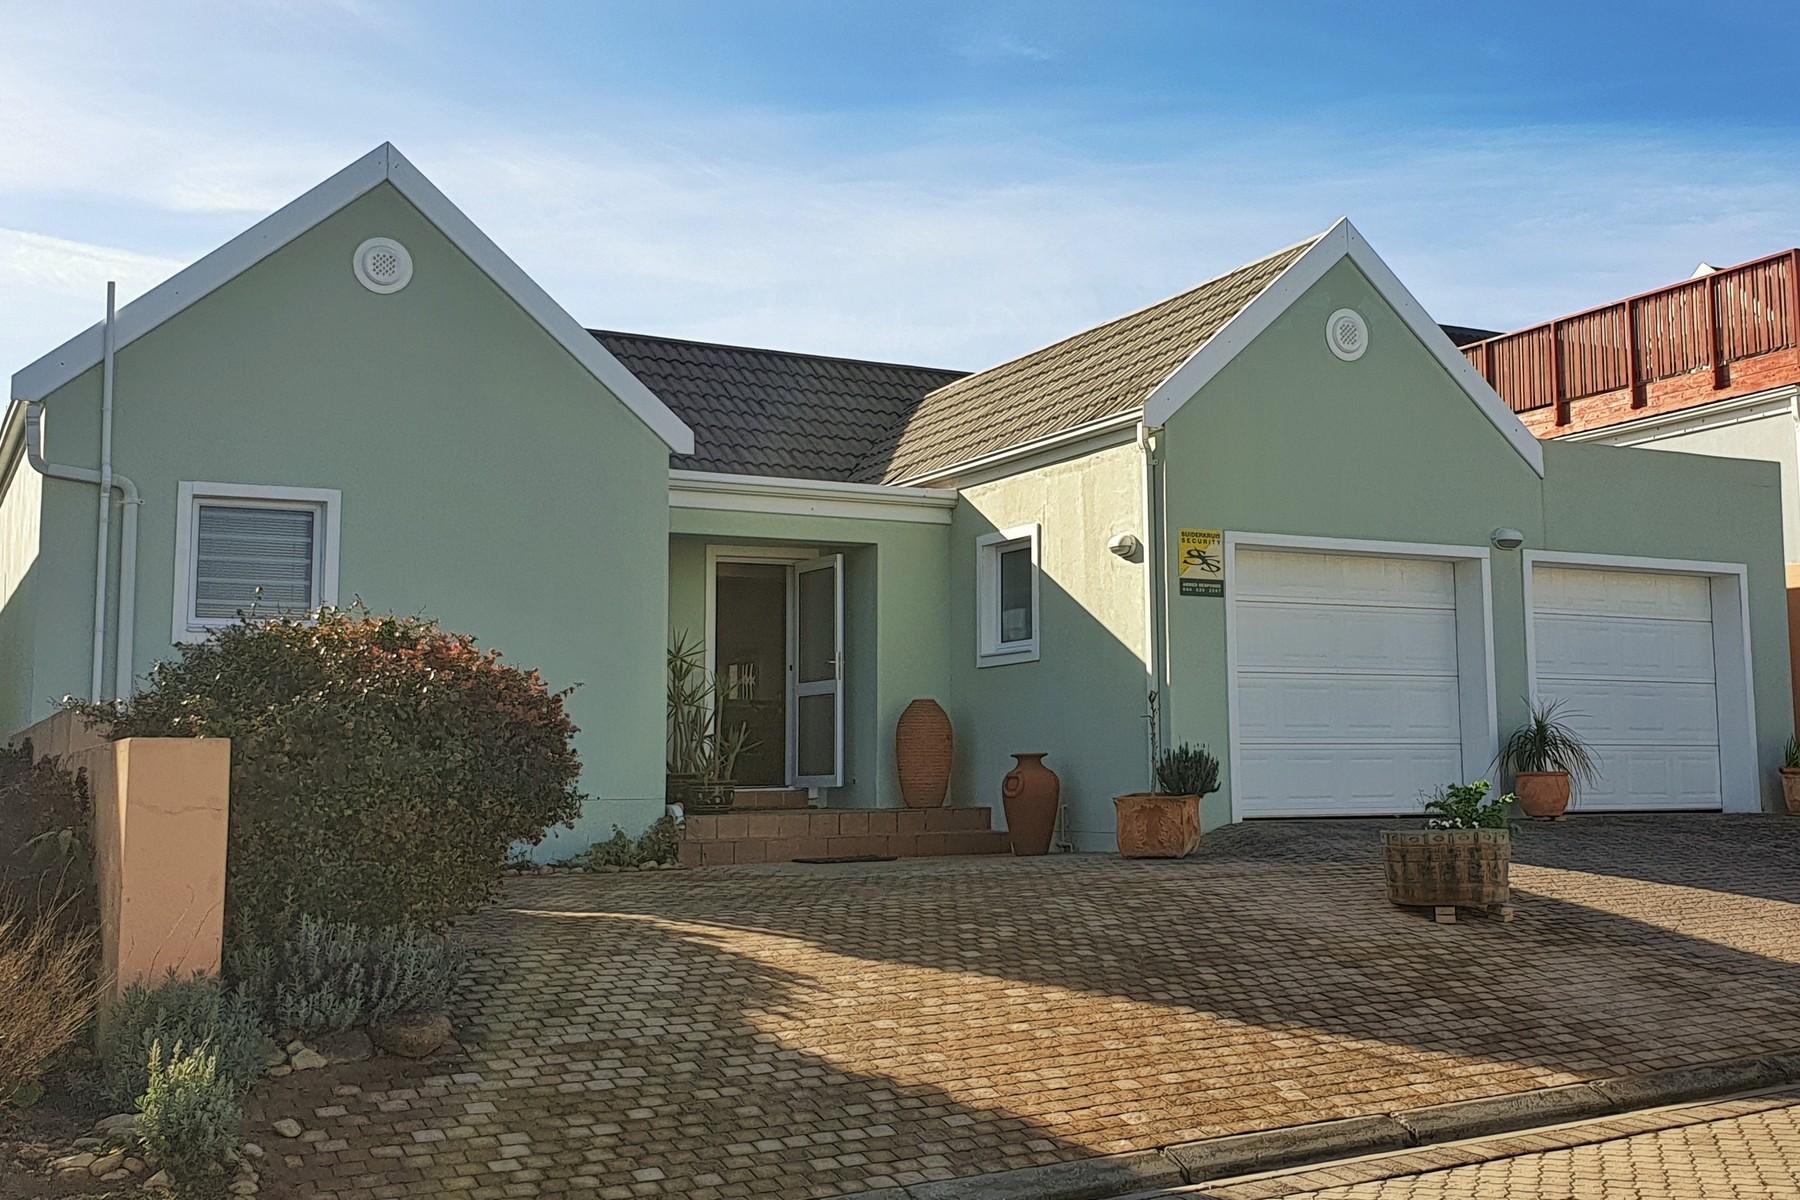 Single Family Homes por un Venta en 18 Zeegezight Close, Zeegezicht, Sedgefield, Garden route 18 Zeegesight Close Zeegezight Sedgefield, Provincia Occidental Del Cabo 6573 Sudáfrica